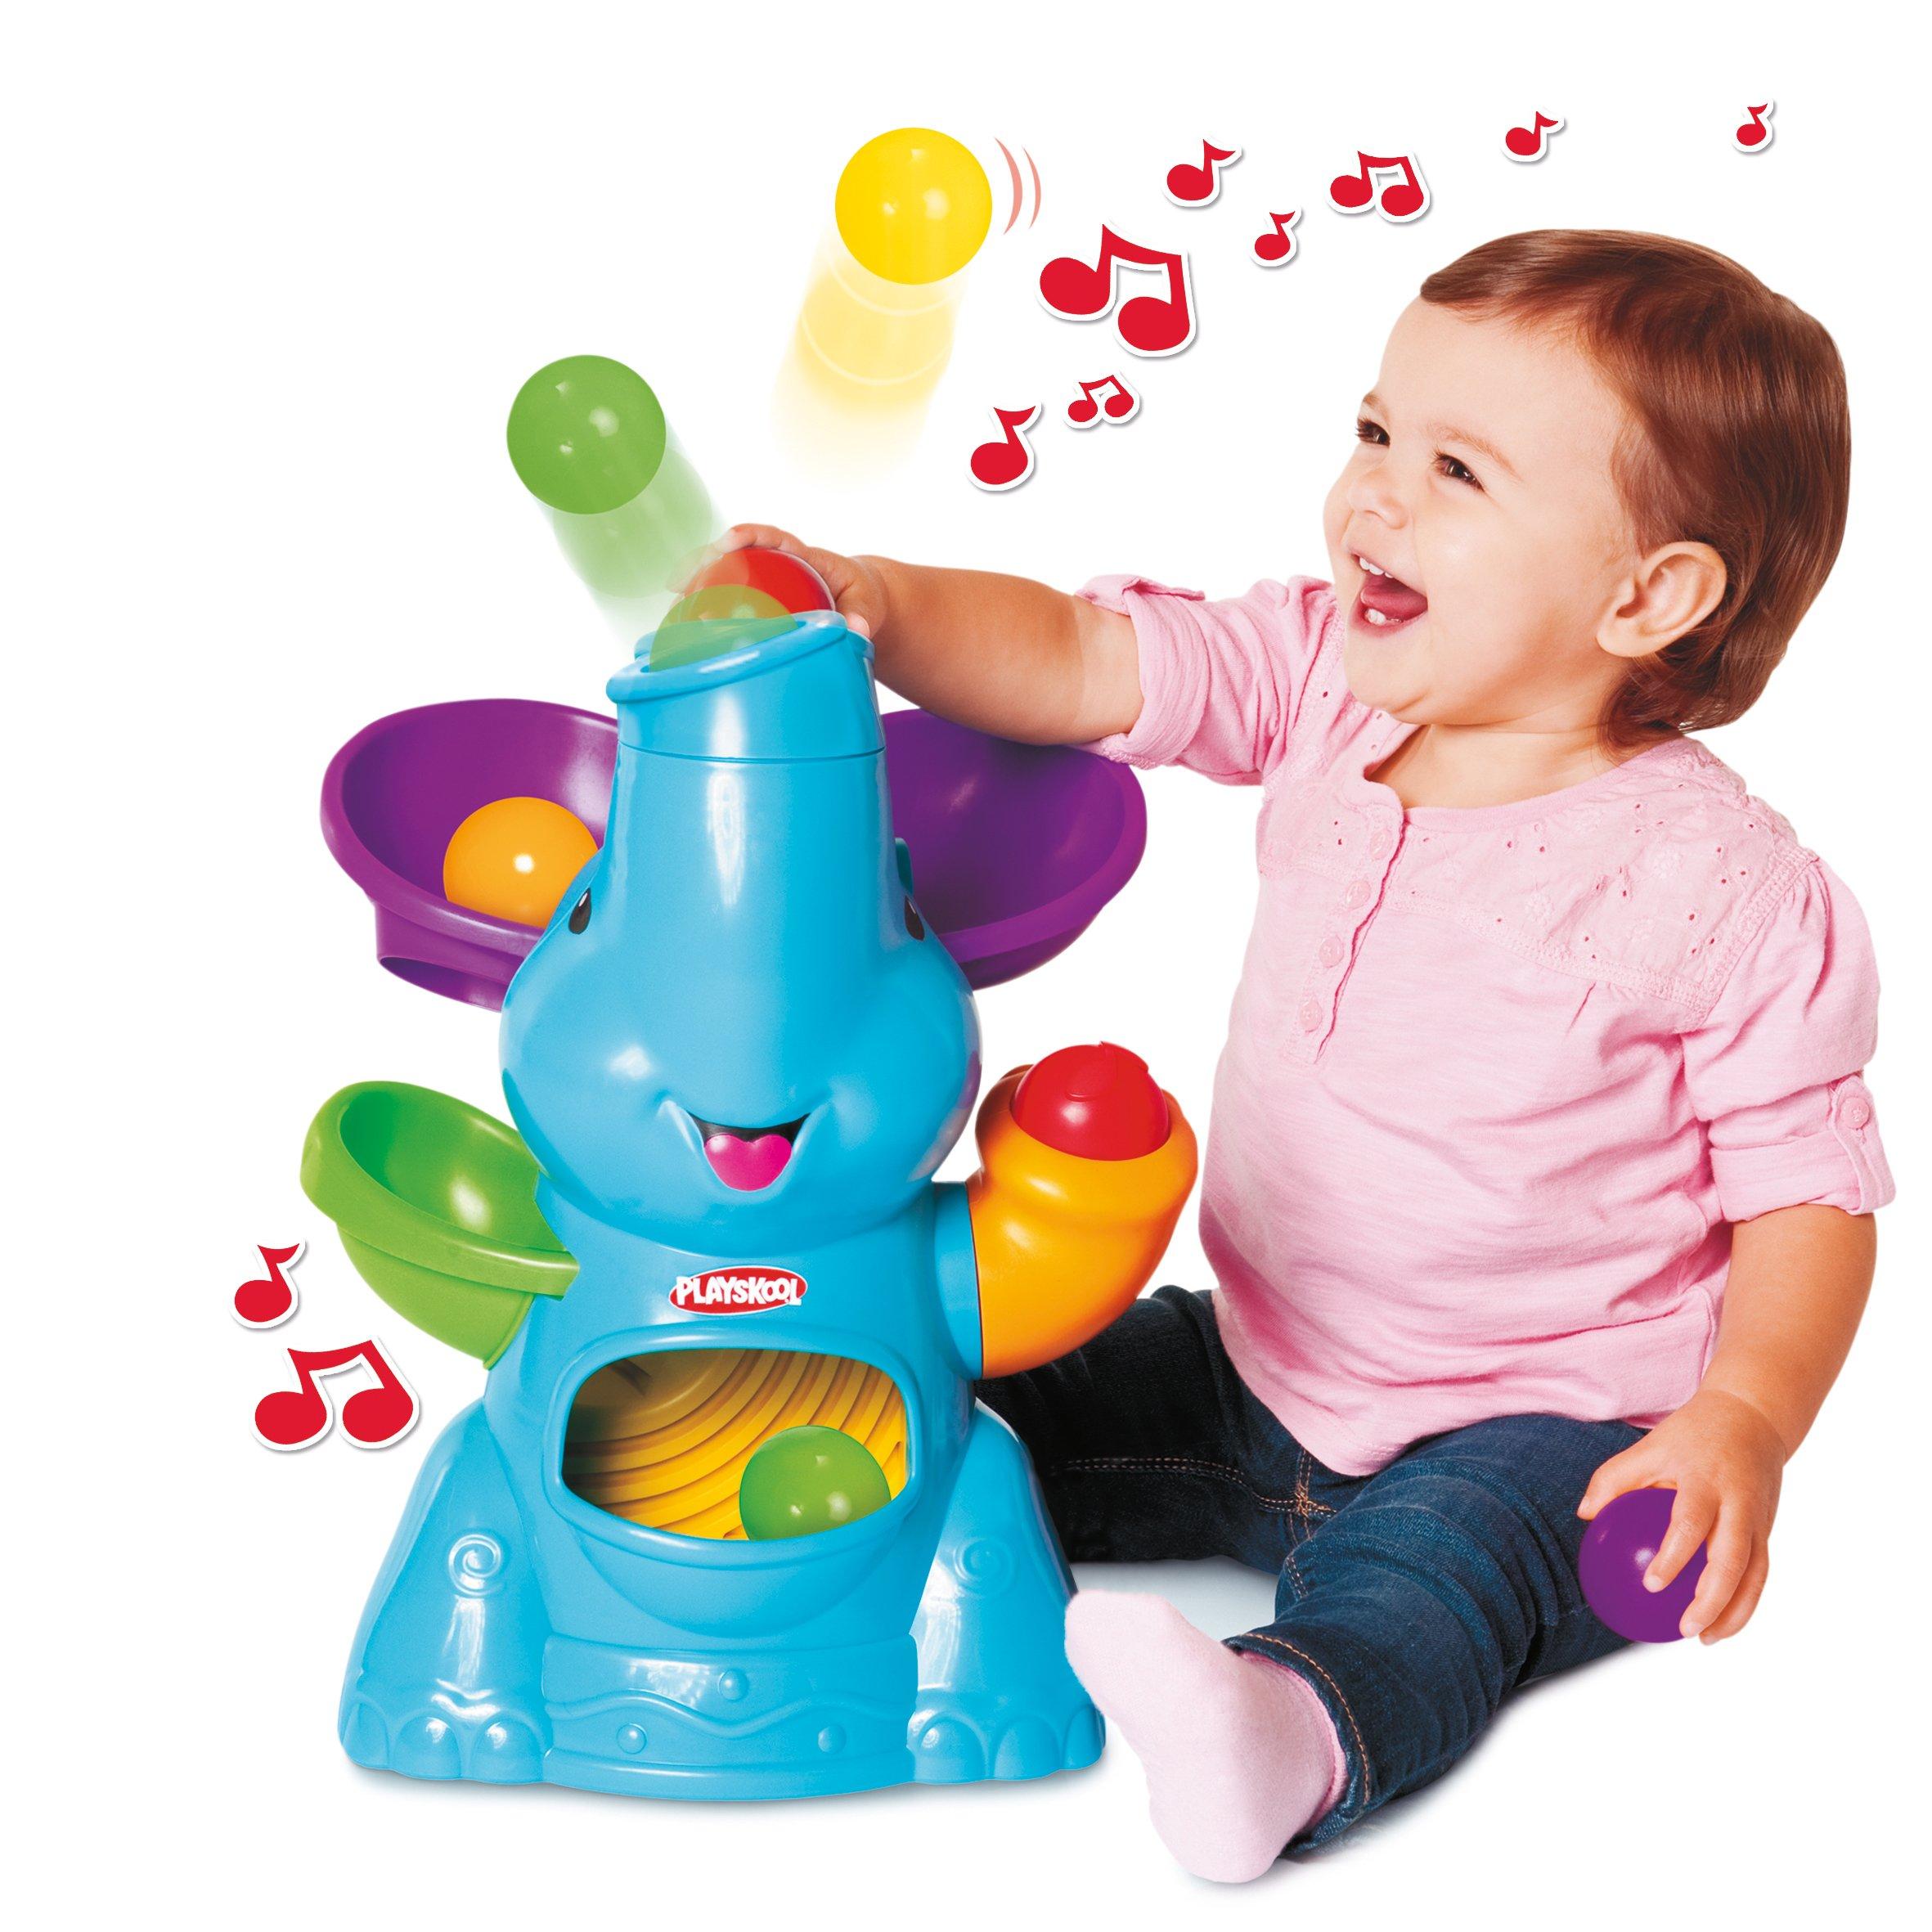 Playskool Poppin' Park Elefun Busy Ball Popper.